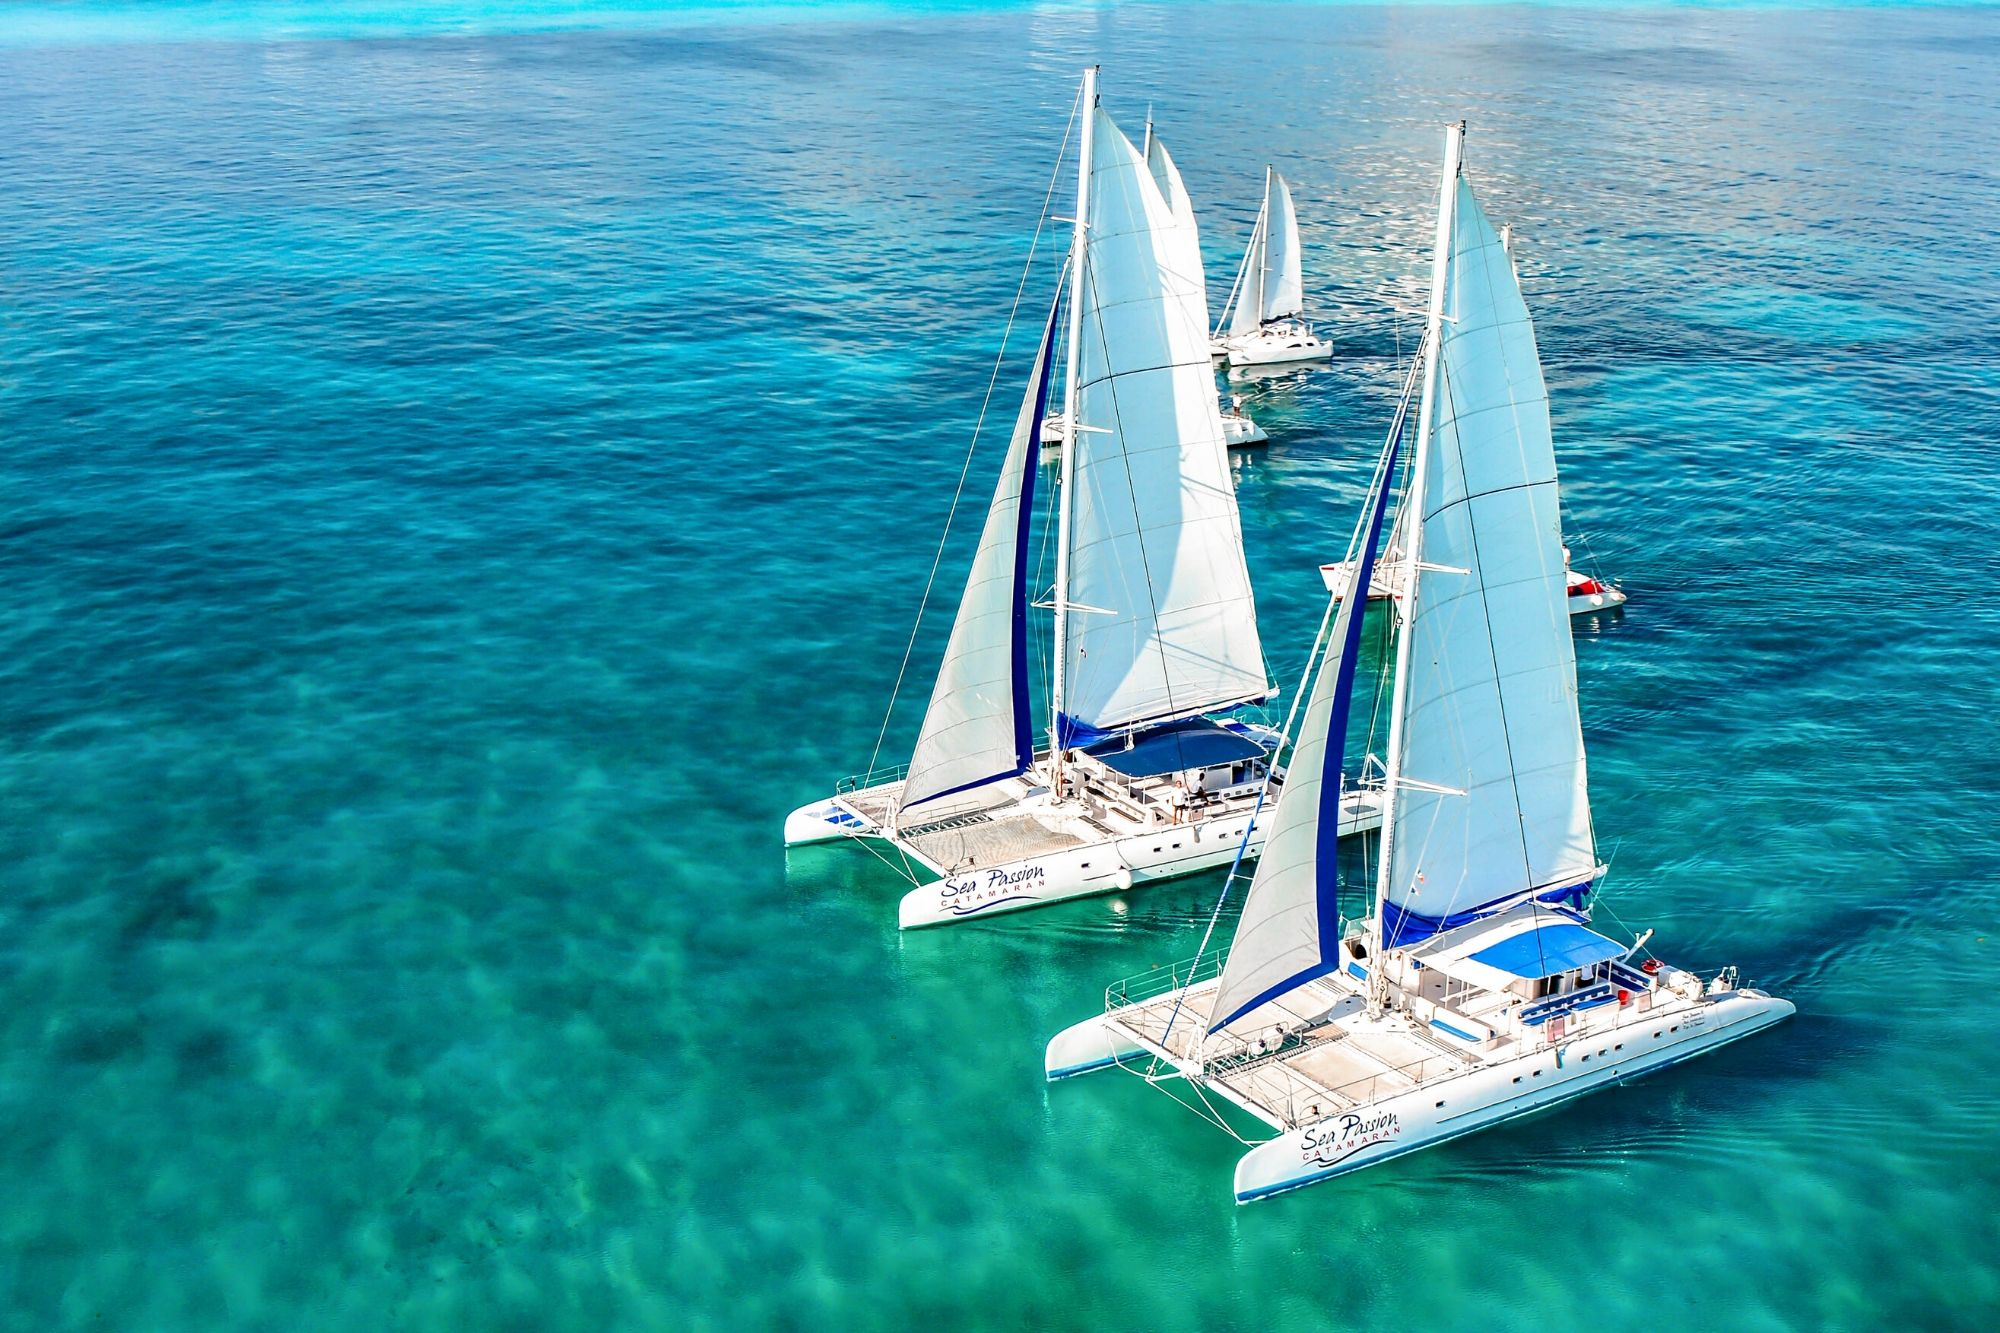 1 Private Isla Mujeres tour in catamaran - Sea Passion I II - Cancun Sailing